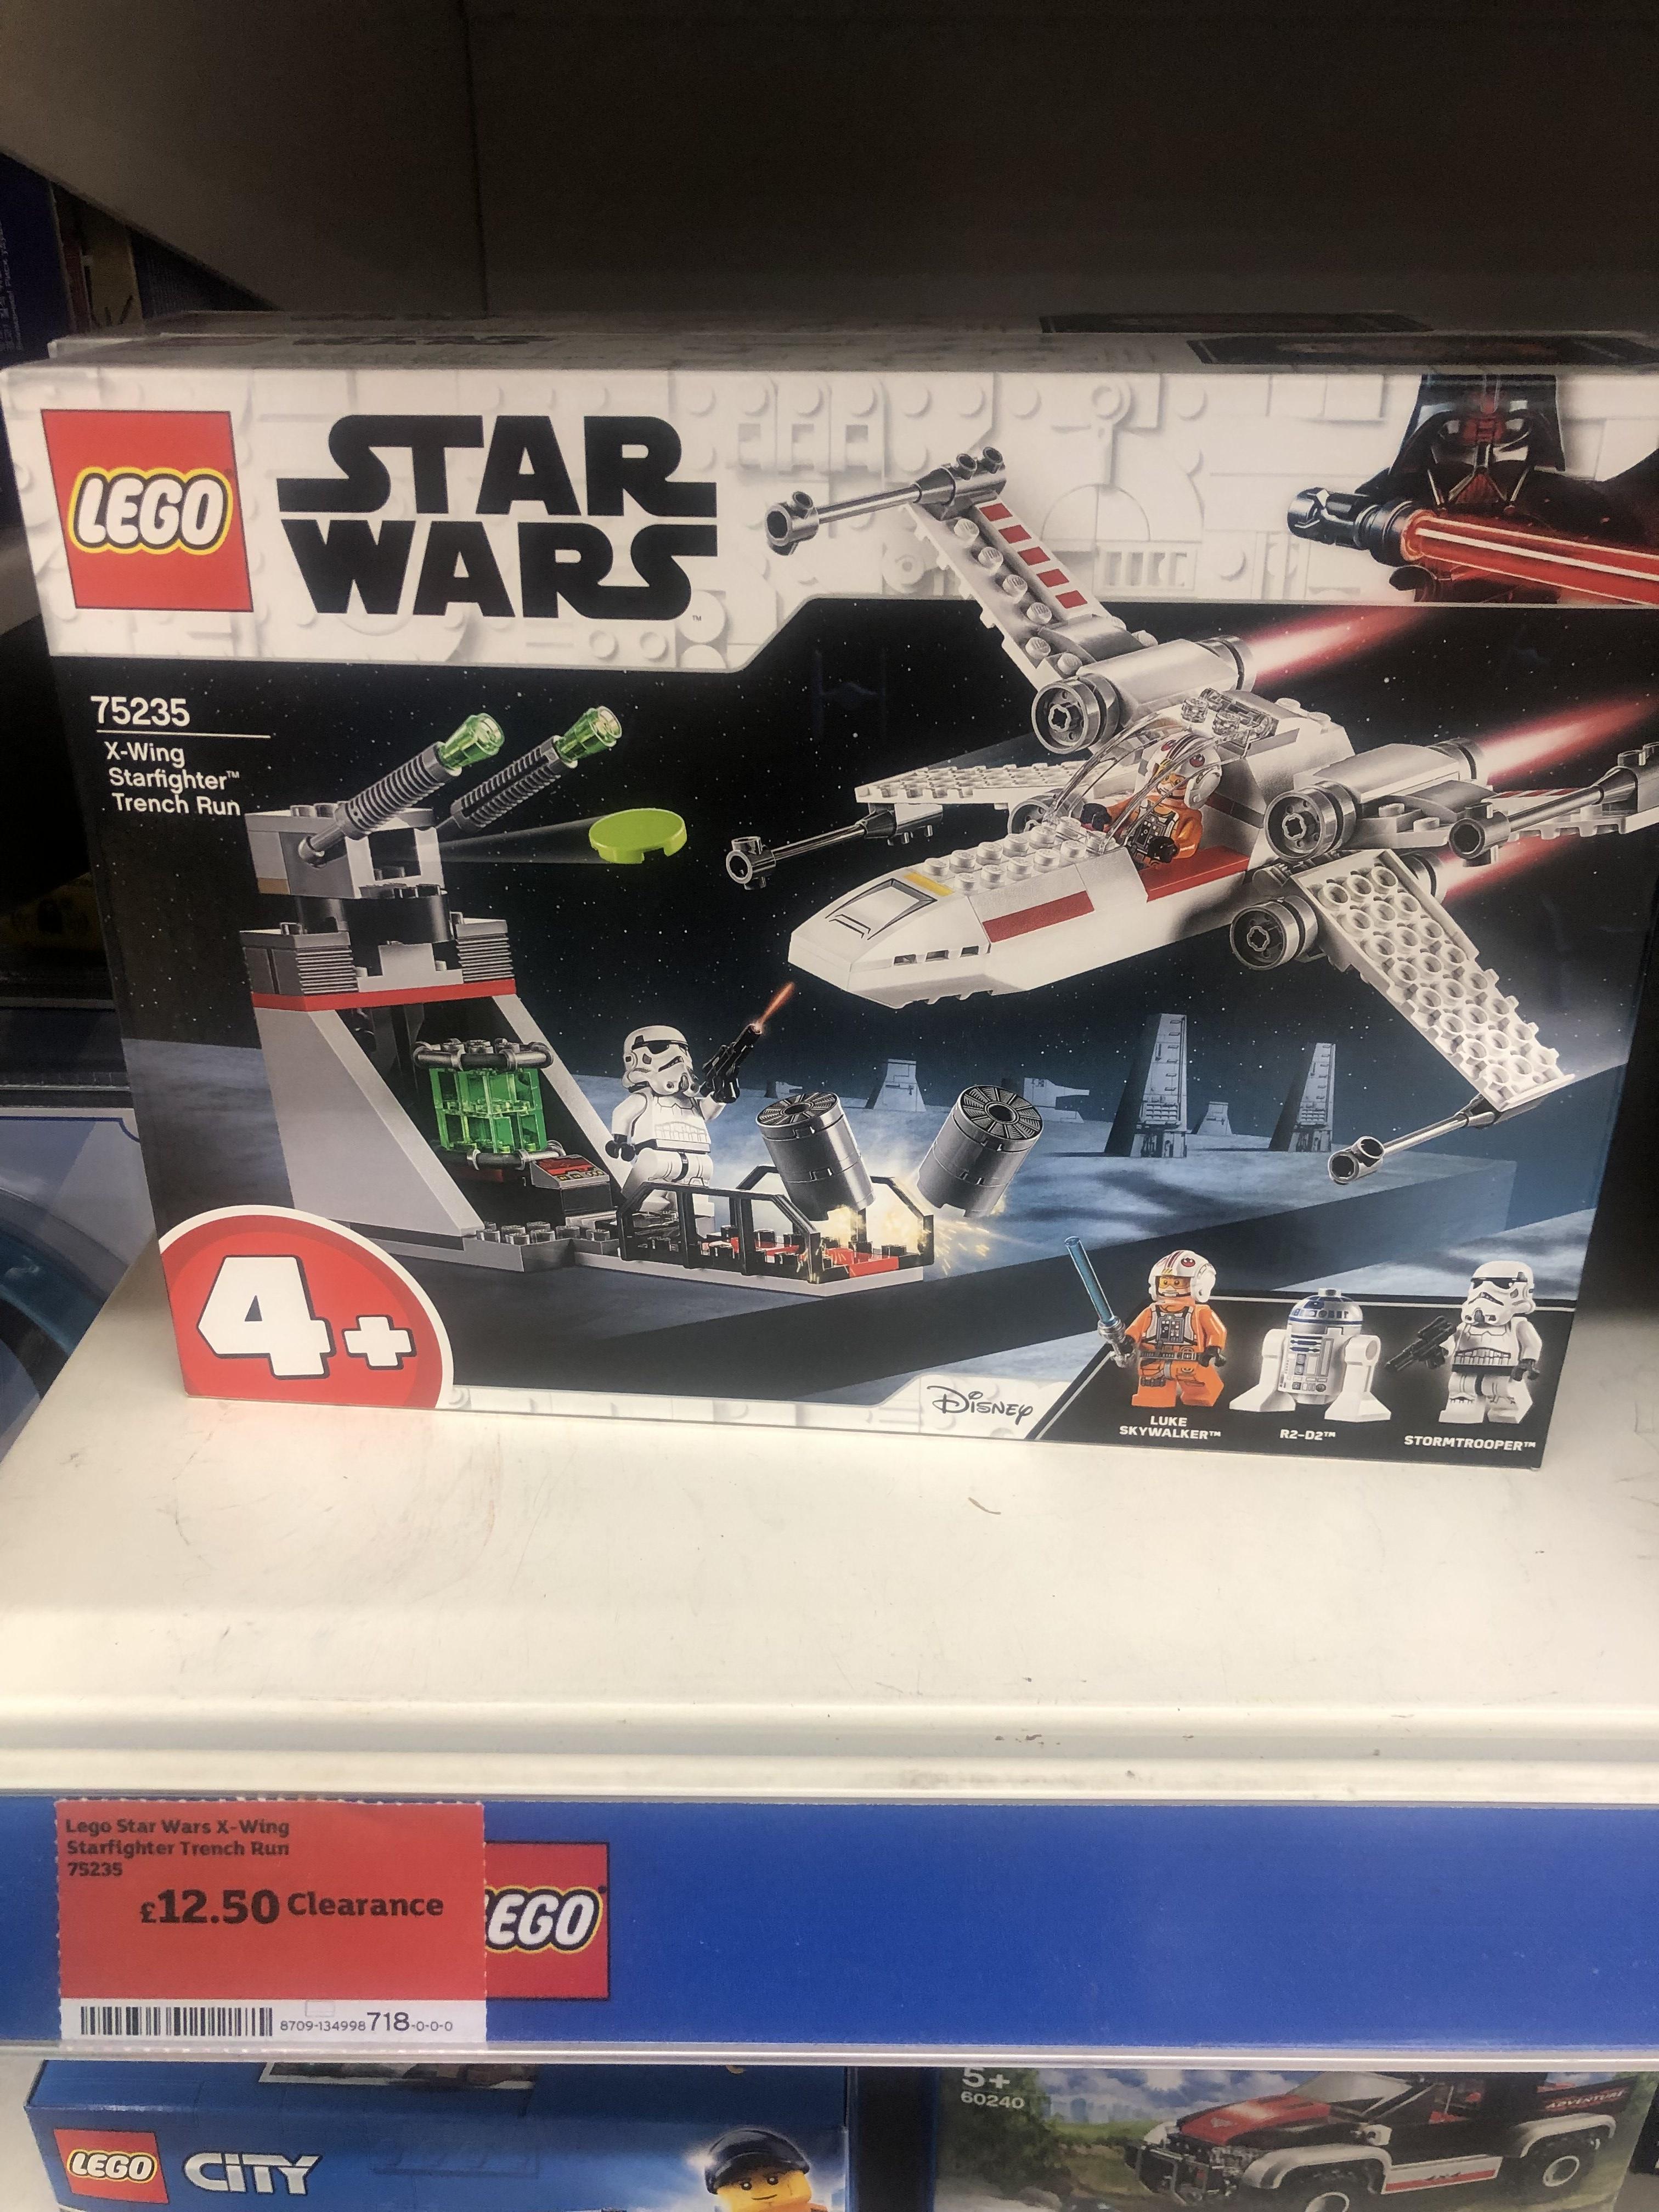 Lego half price instore (75235 £12.50, 70826 for £12) at Sainsbury's (found Fareham)